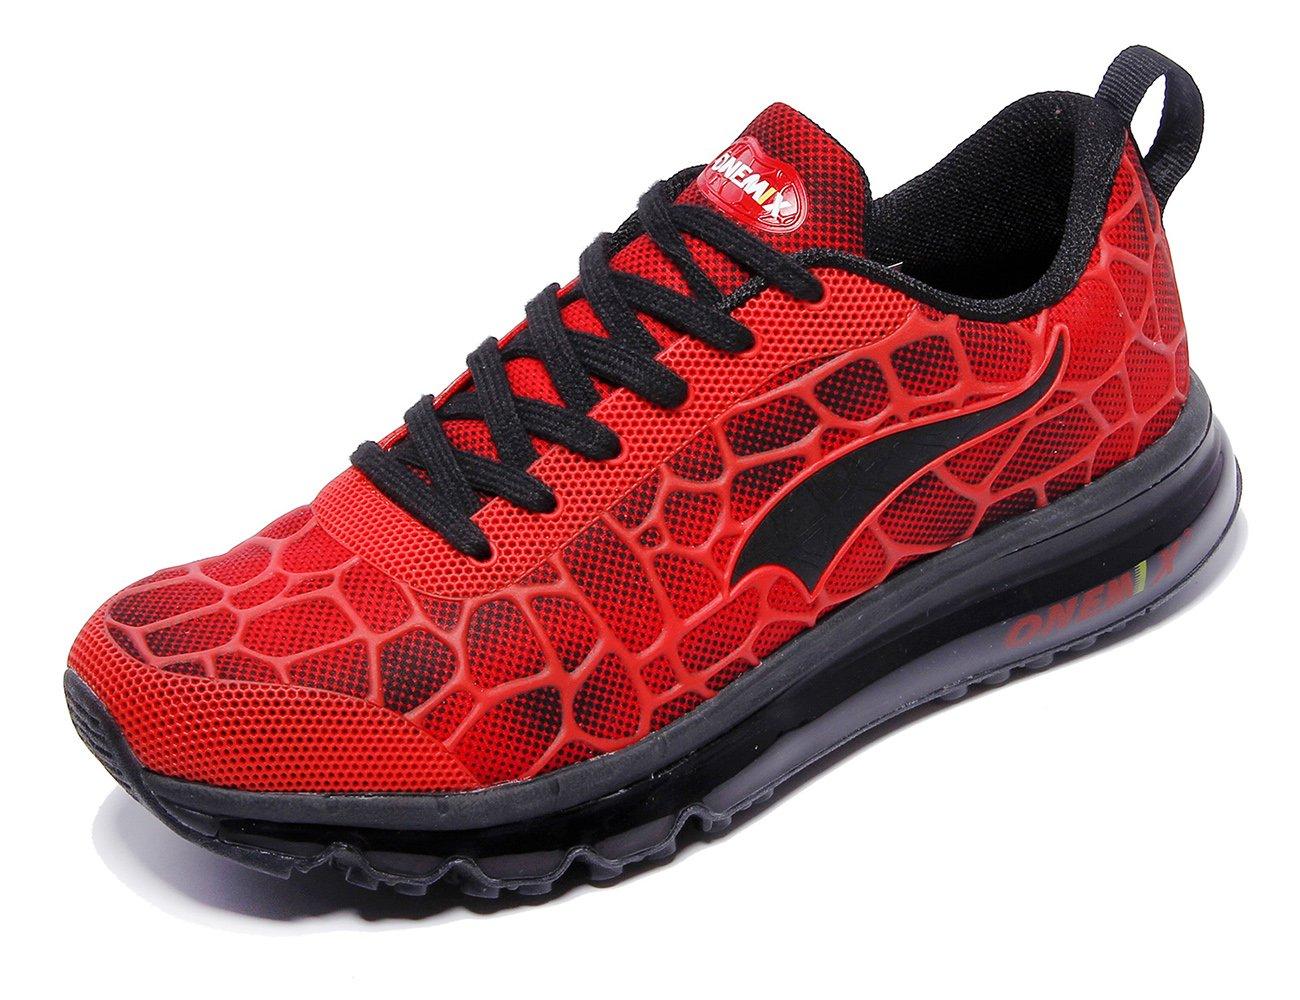 ONEMIX Women's Air Cushiong Running Shoes,Lightweight Sport Athletic Sneakers B07CCH9KBY Men 8(M)US 41EU/women 9.5(M)US 41EU|Red/Black